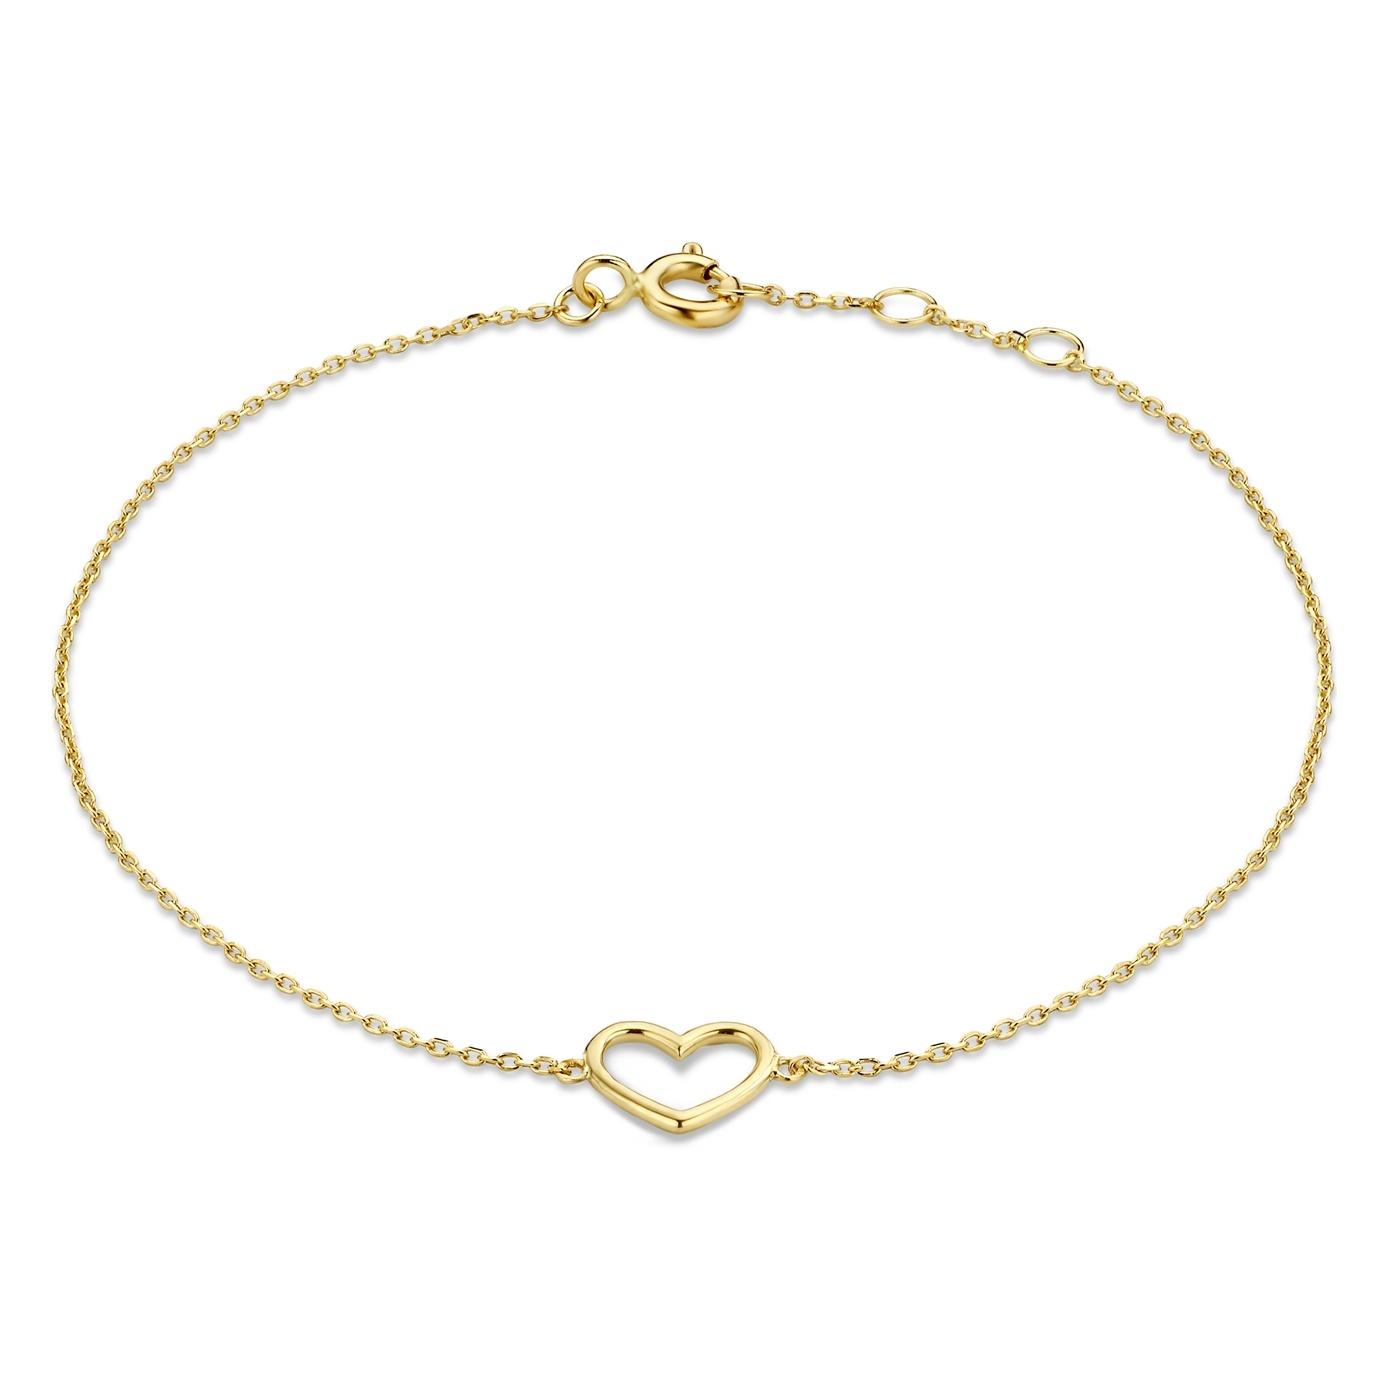 Isabel Bernard Le Marais Alix 14 karat guld armbånd hjerte